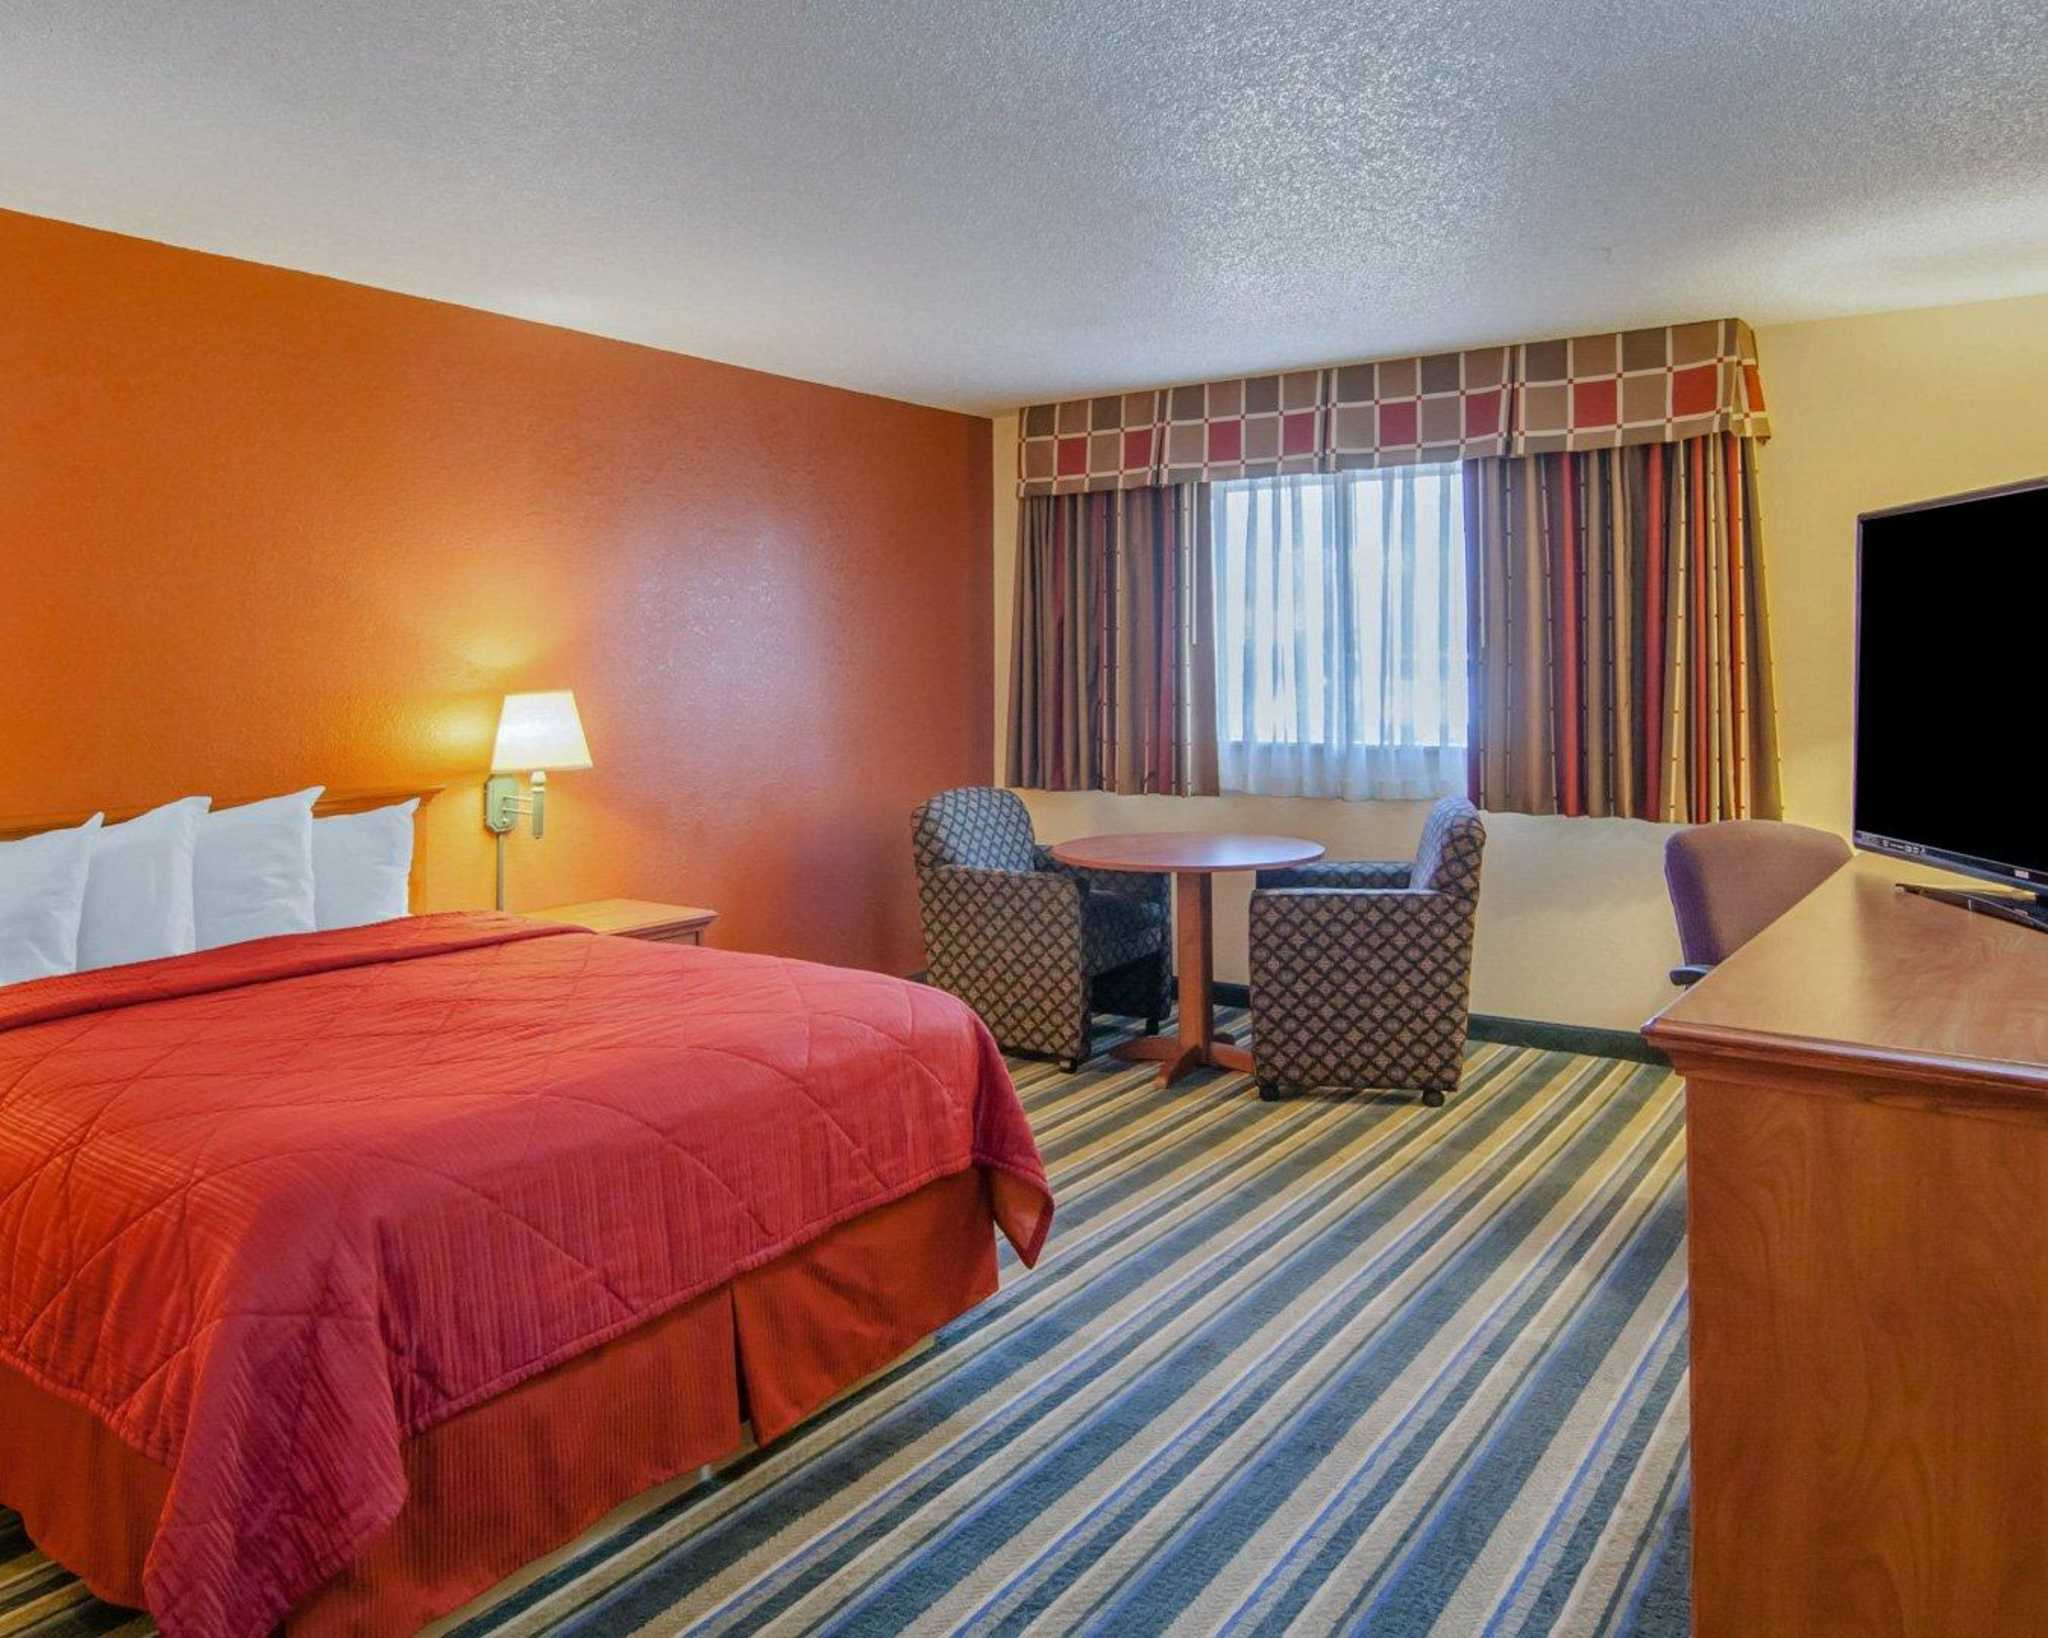 Ashland Inn Hotel And Suites